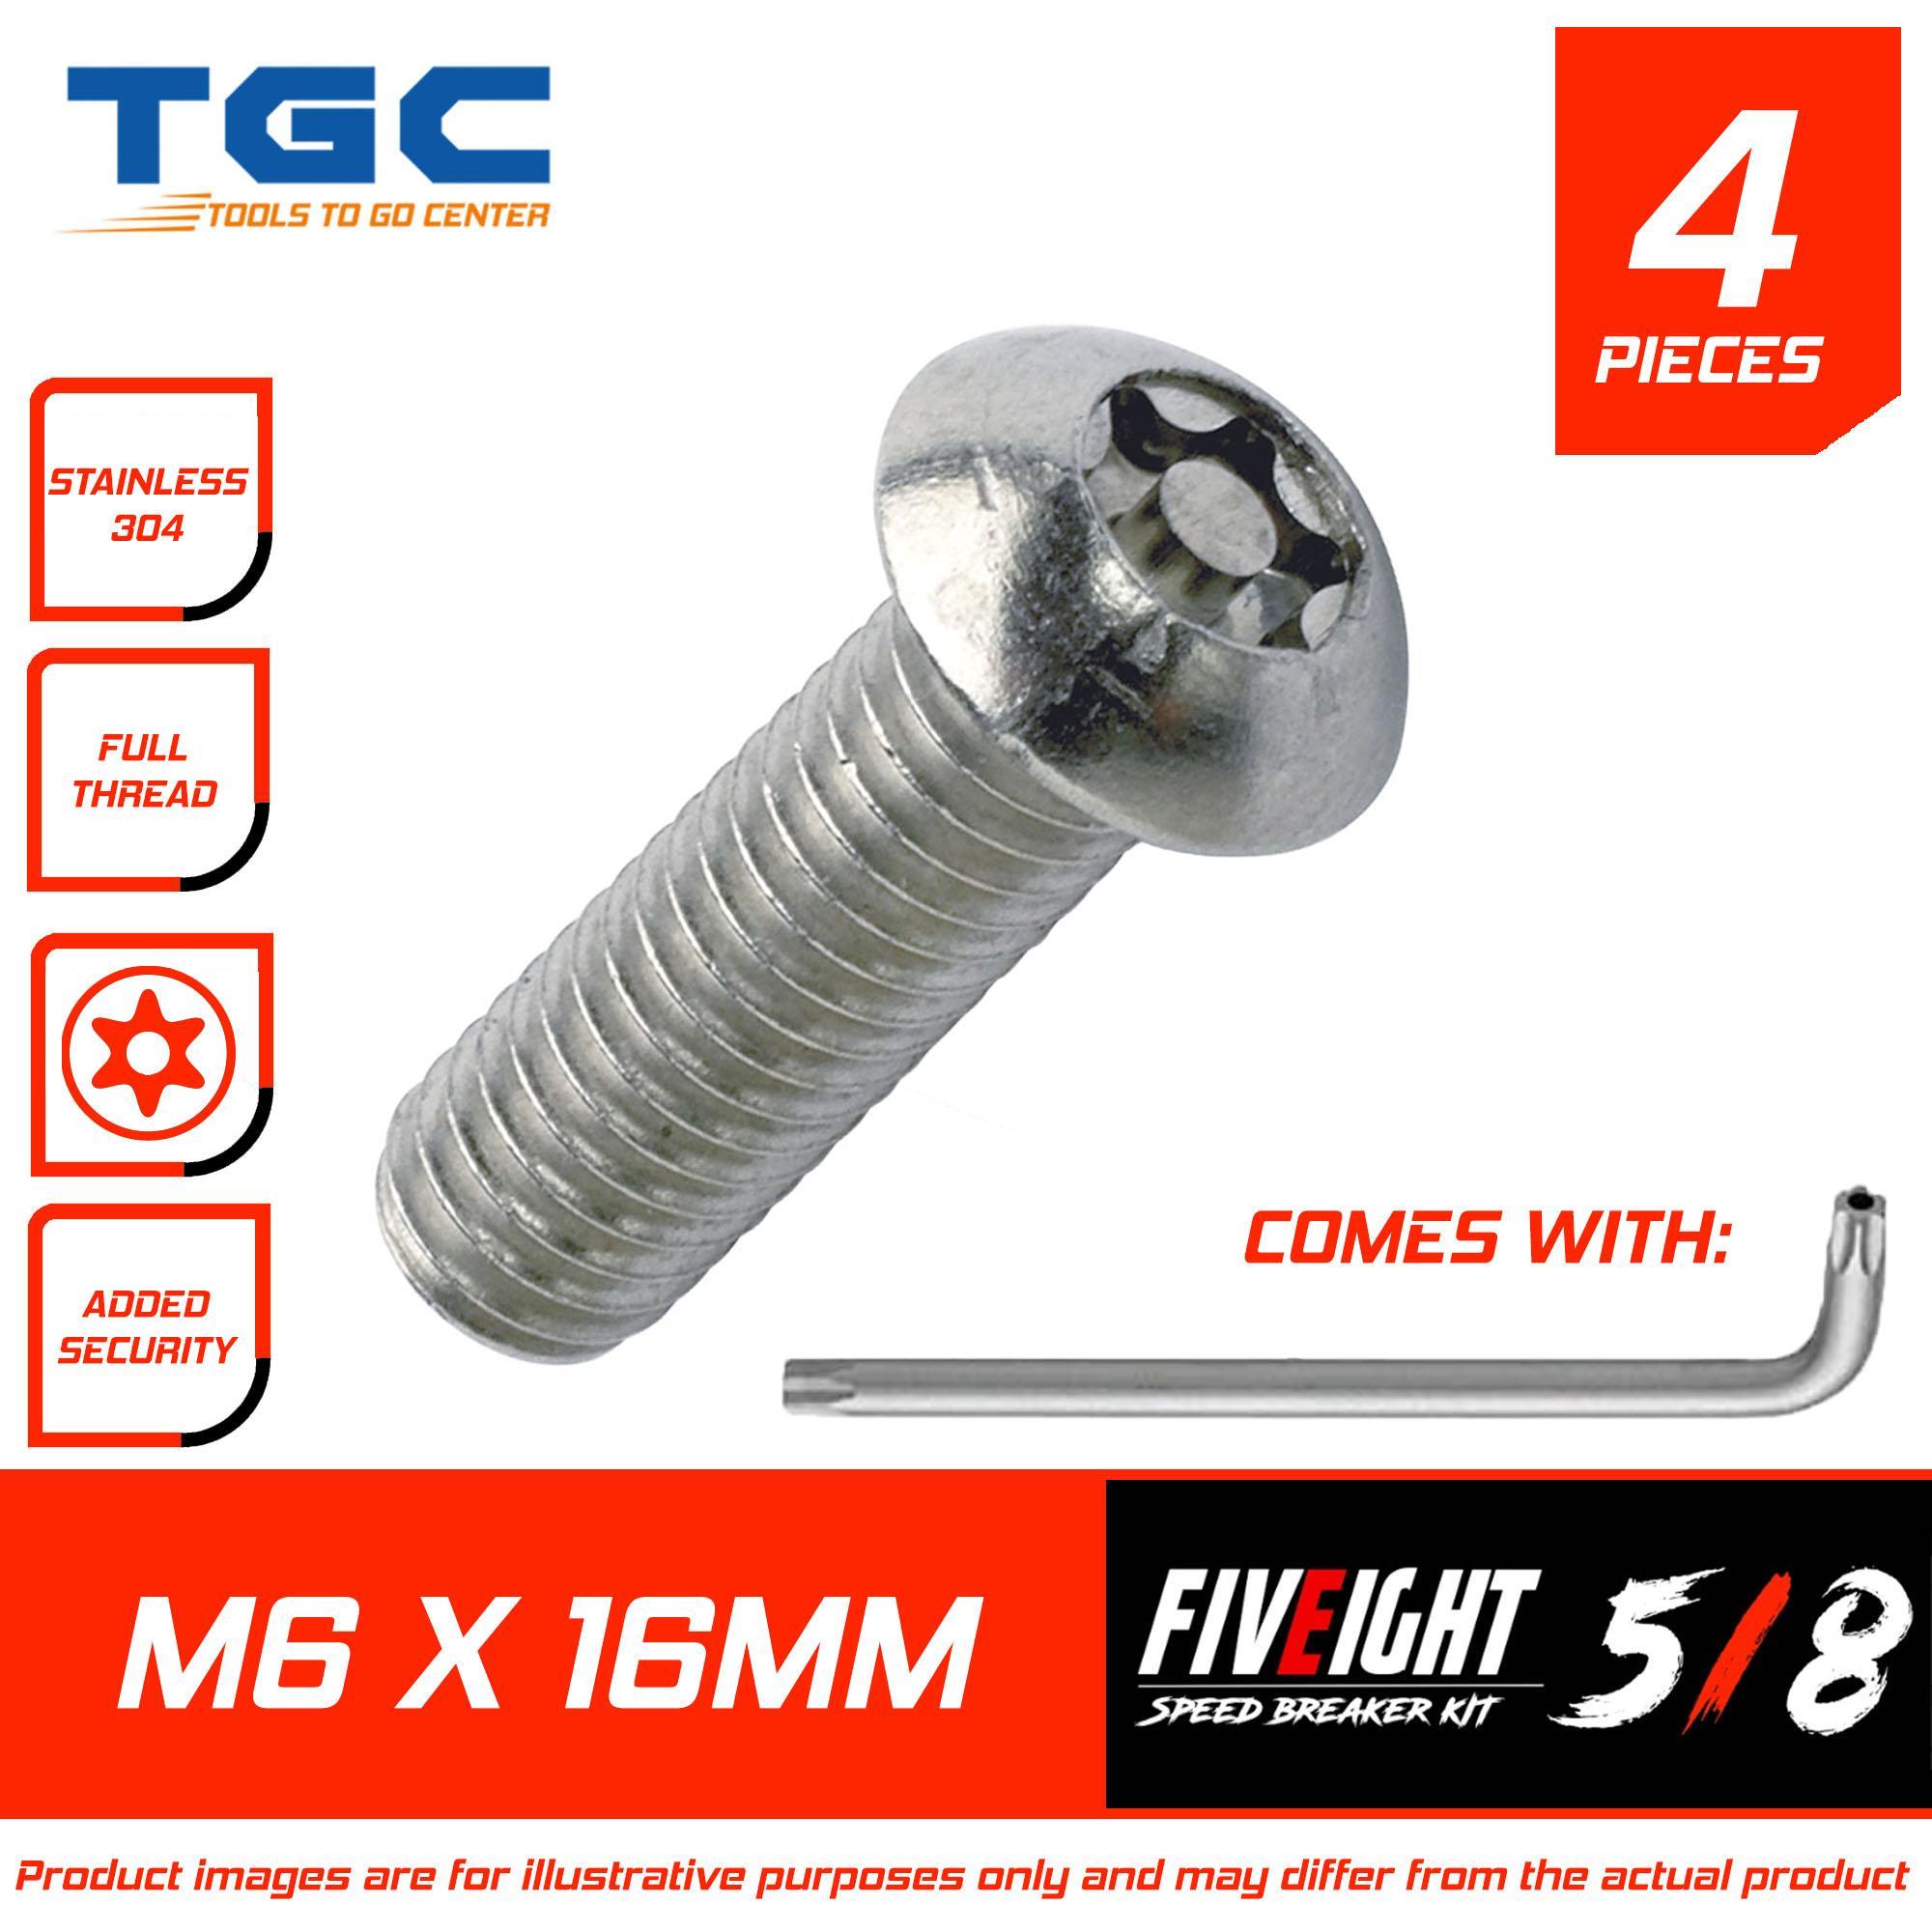 30pcs Star Male Female Sockets Torx Bit E & T Ratchet Socket Wrench Head And Torx Star Socket Set Auto Repair Tools Tool Sets